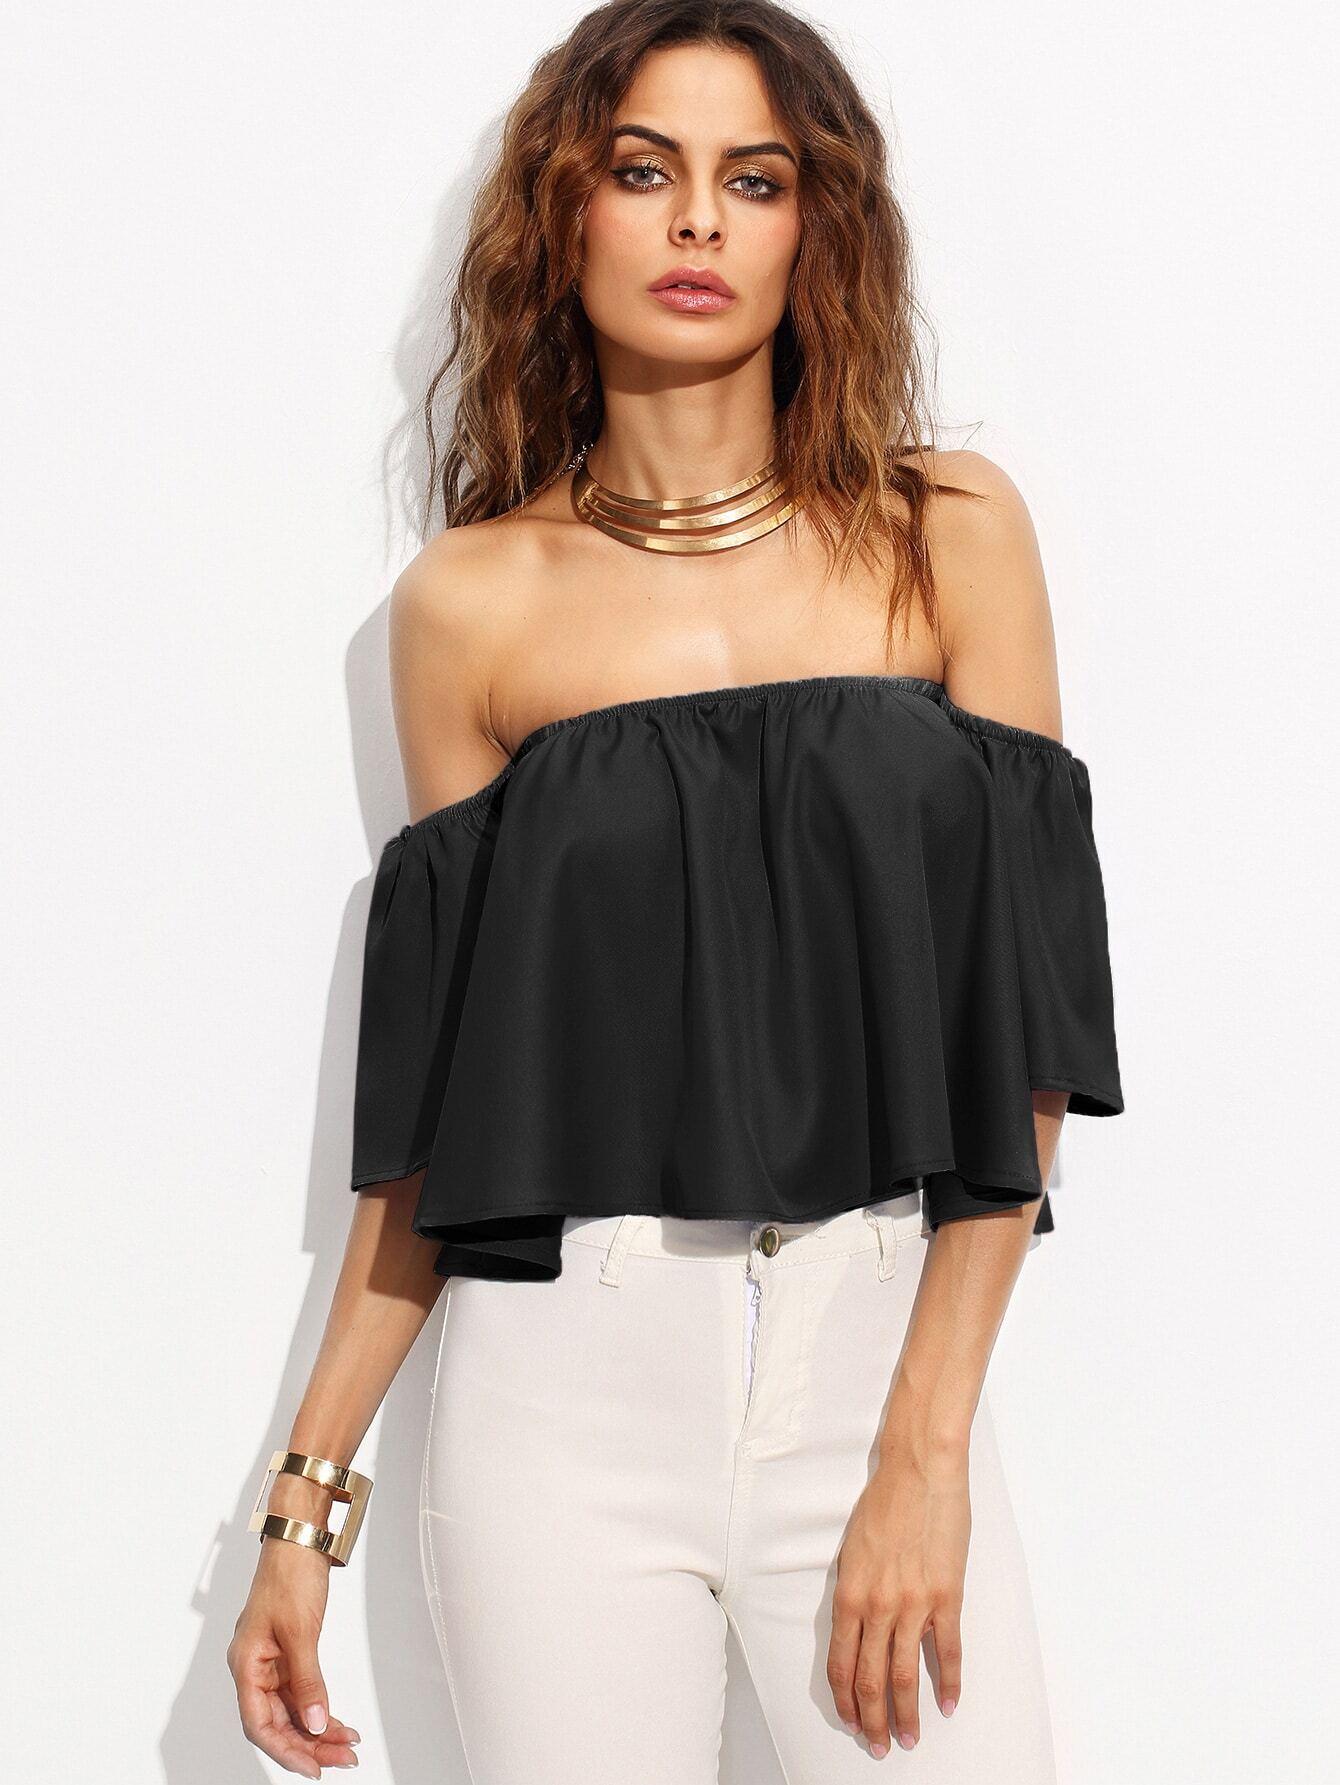 ec6f4364d09bc Off Shoulder Crop Top EmmaCloth-Women Fast Fashion Online